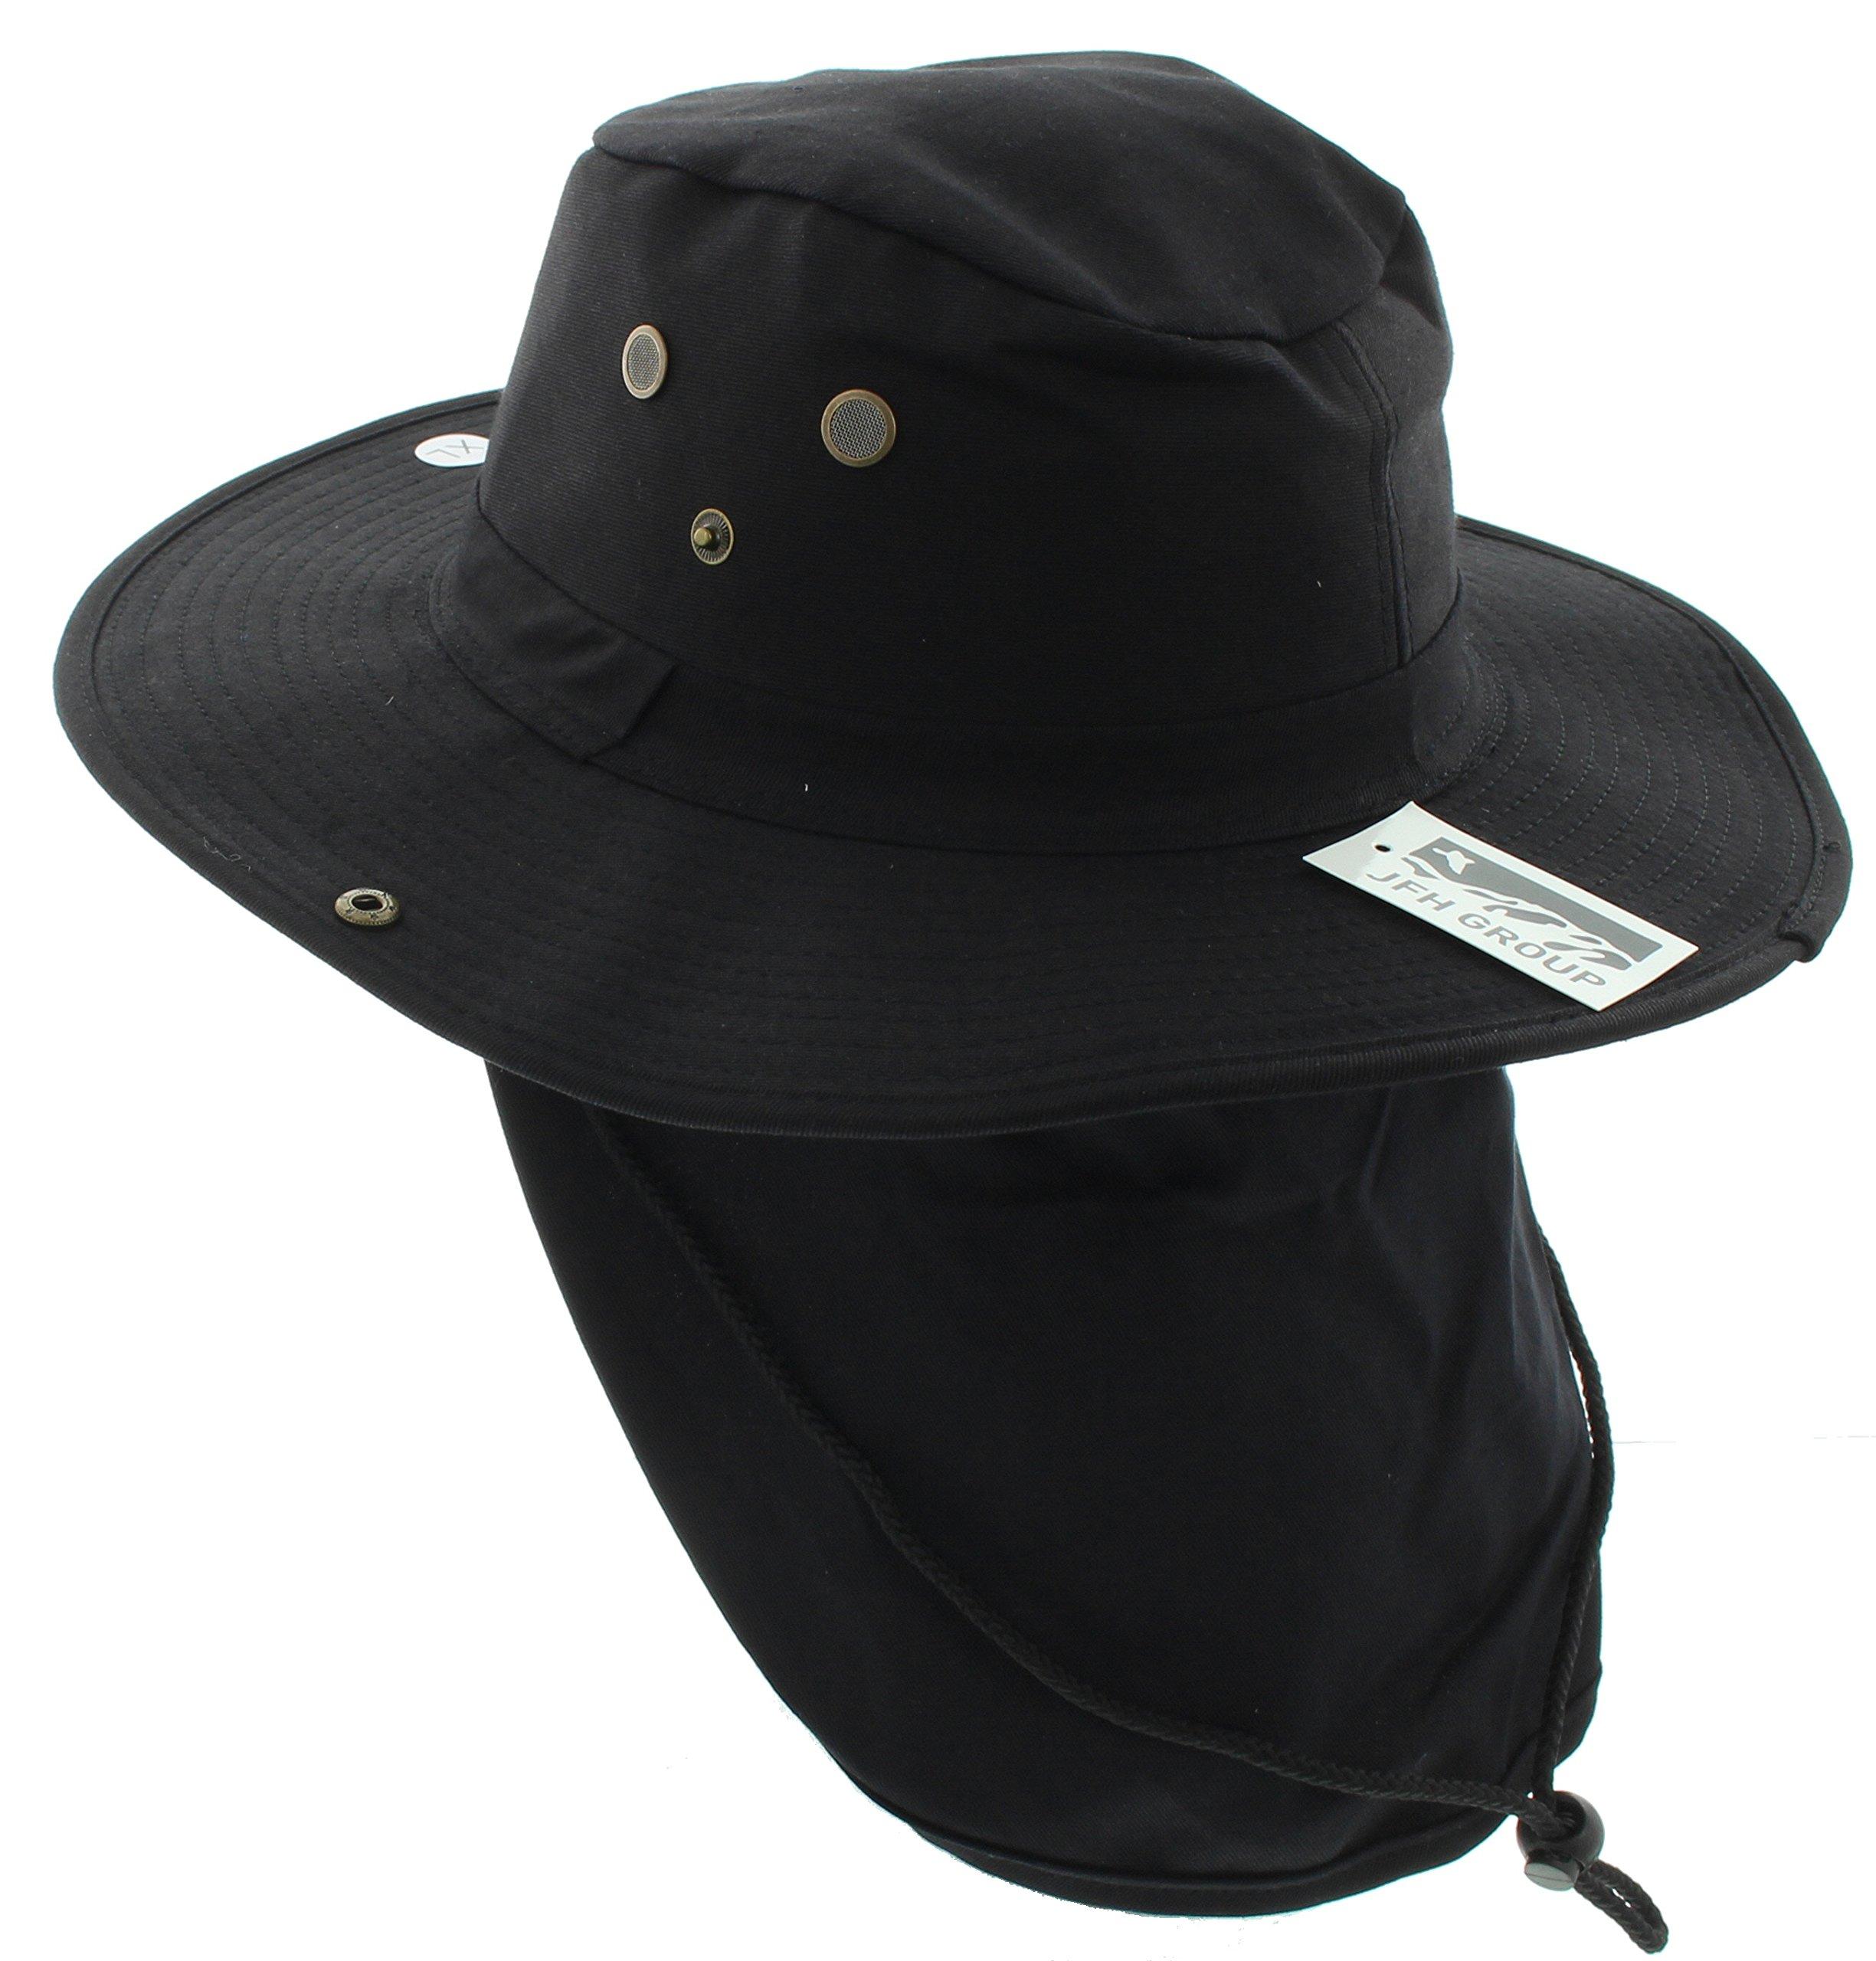 80432629d8367b Galleon - Wide Brim Unisex Safari/Outback Summer Hat W/Neck Flap (Extra  Large, Black Solid)